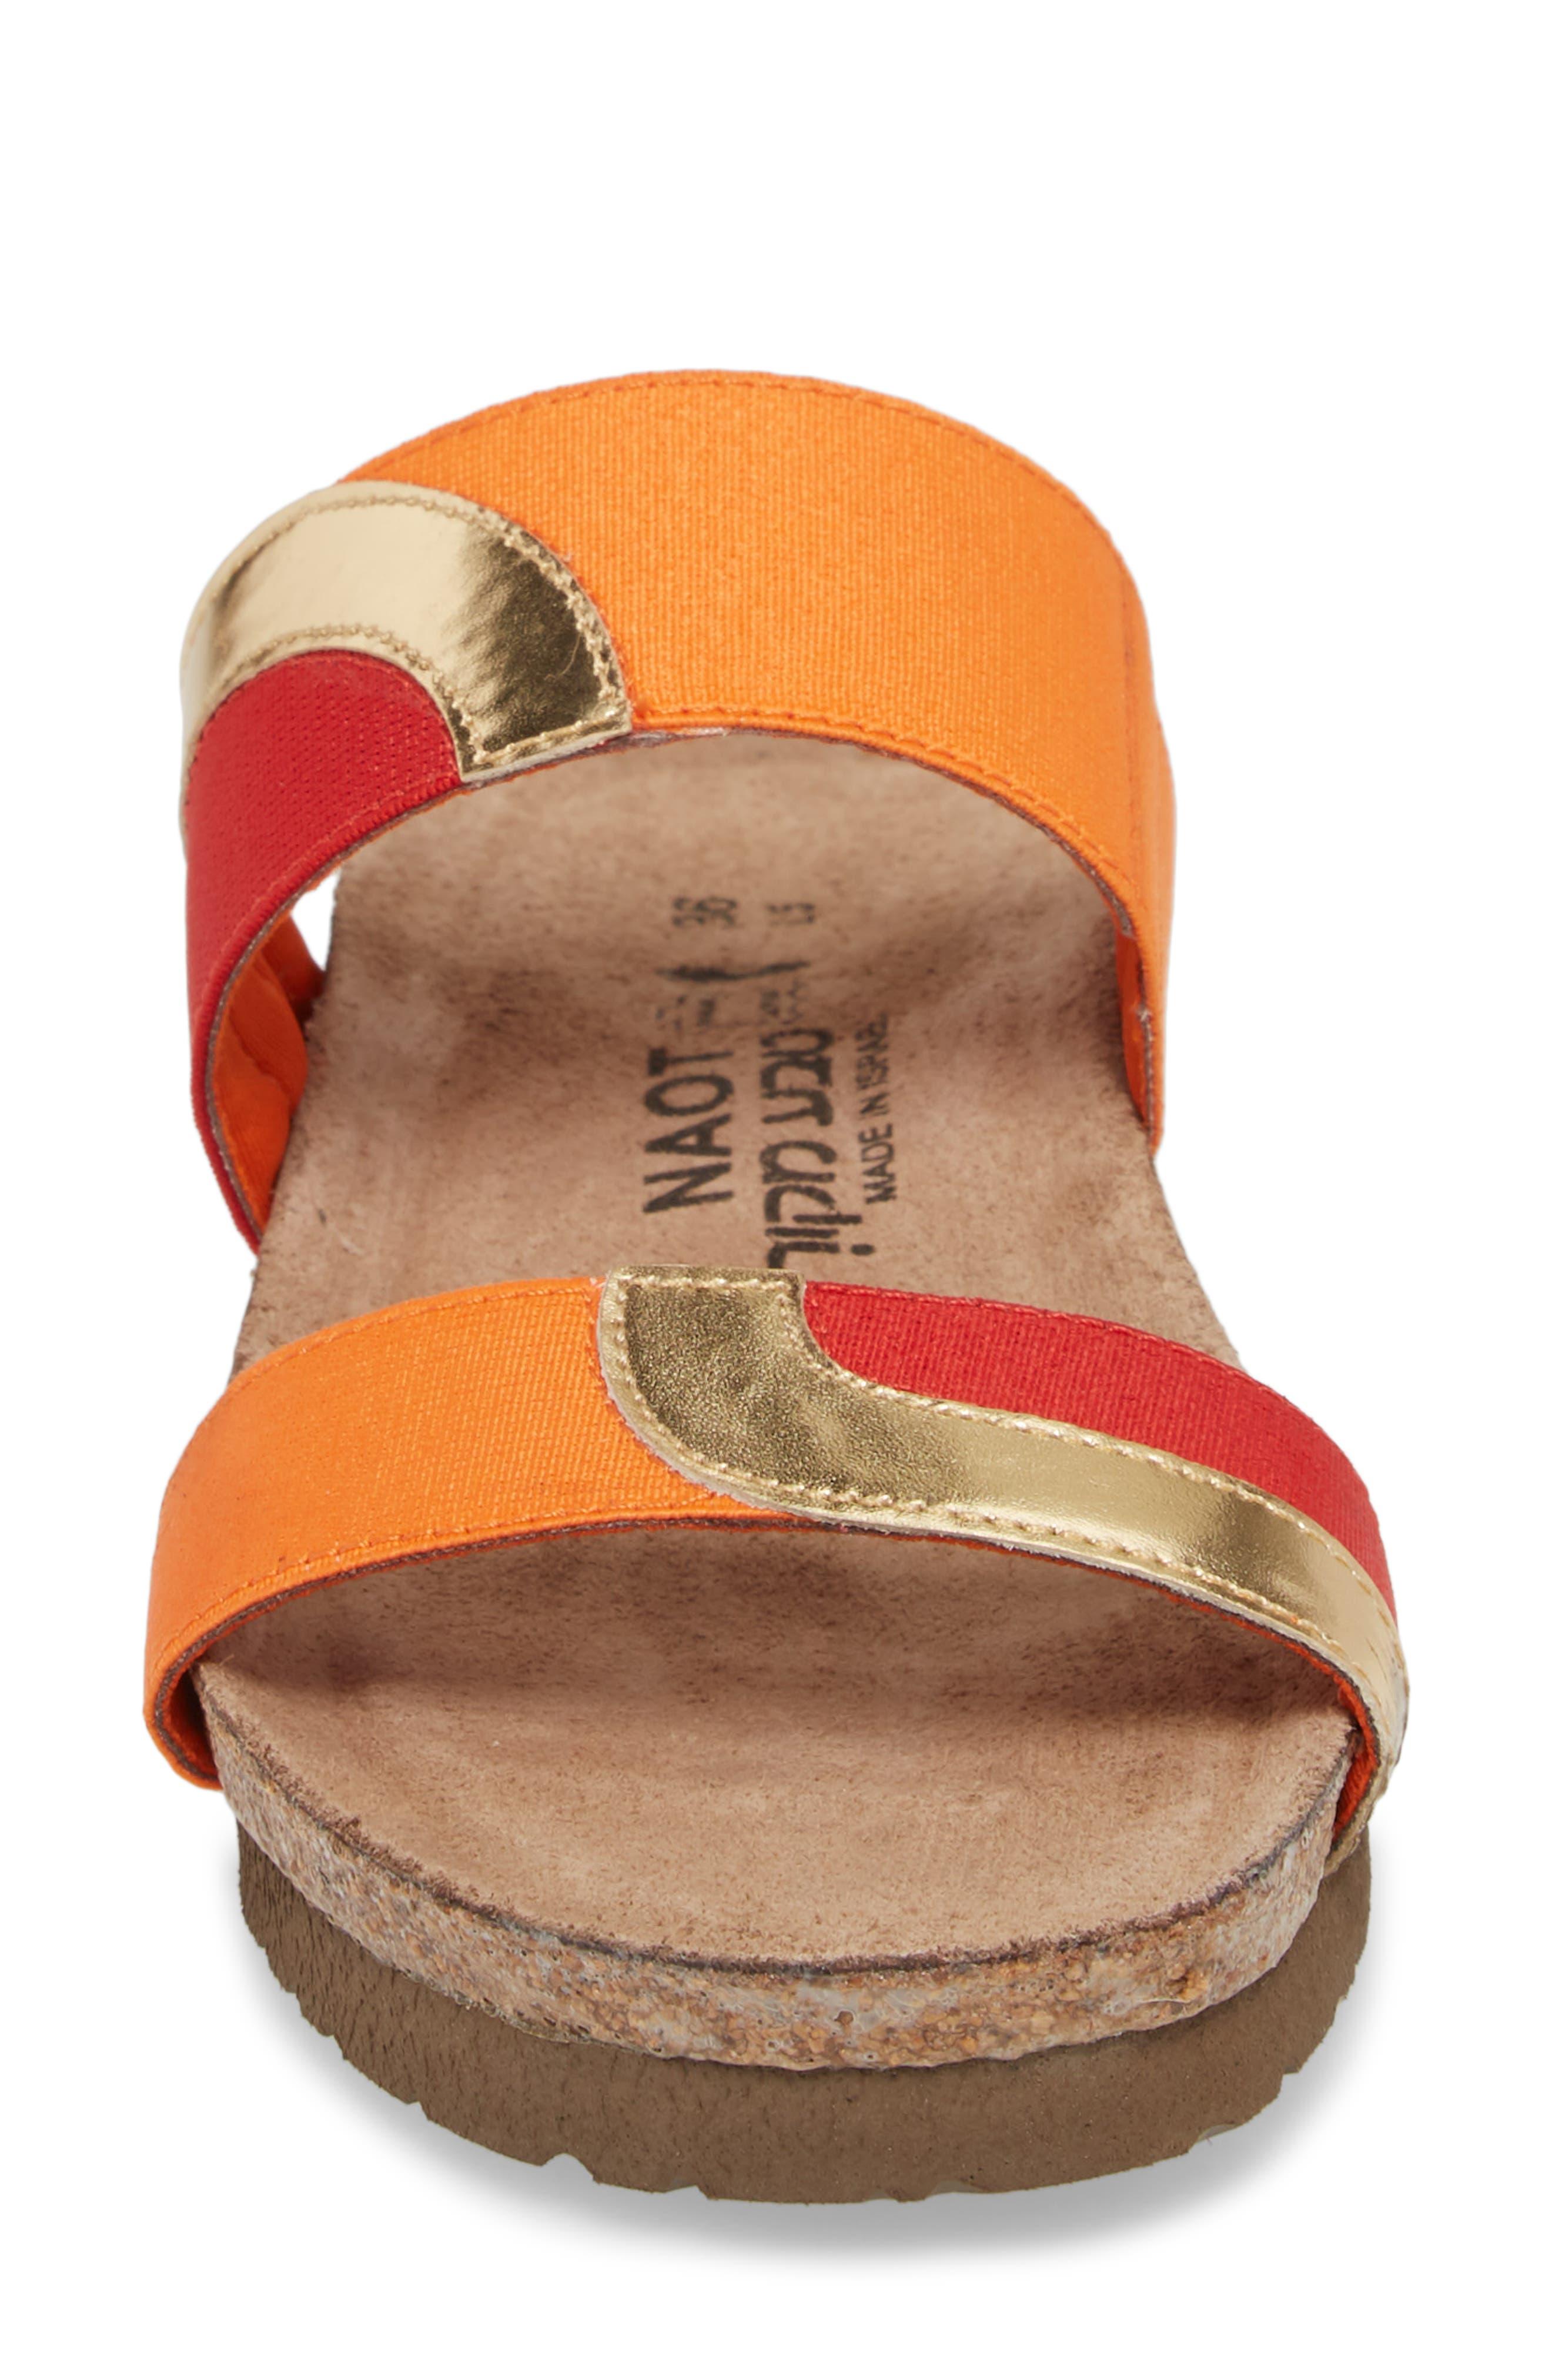 Frankie Slide Sandal,                             Alternate thumbnail 4, color,                             Red/ Orange/ Gold Leather